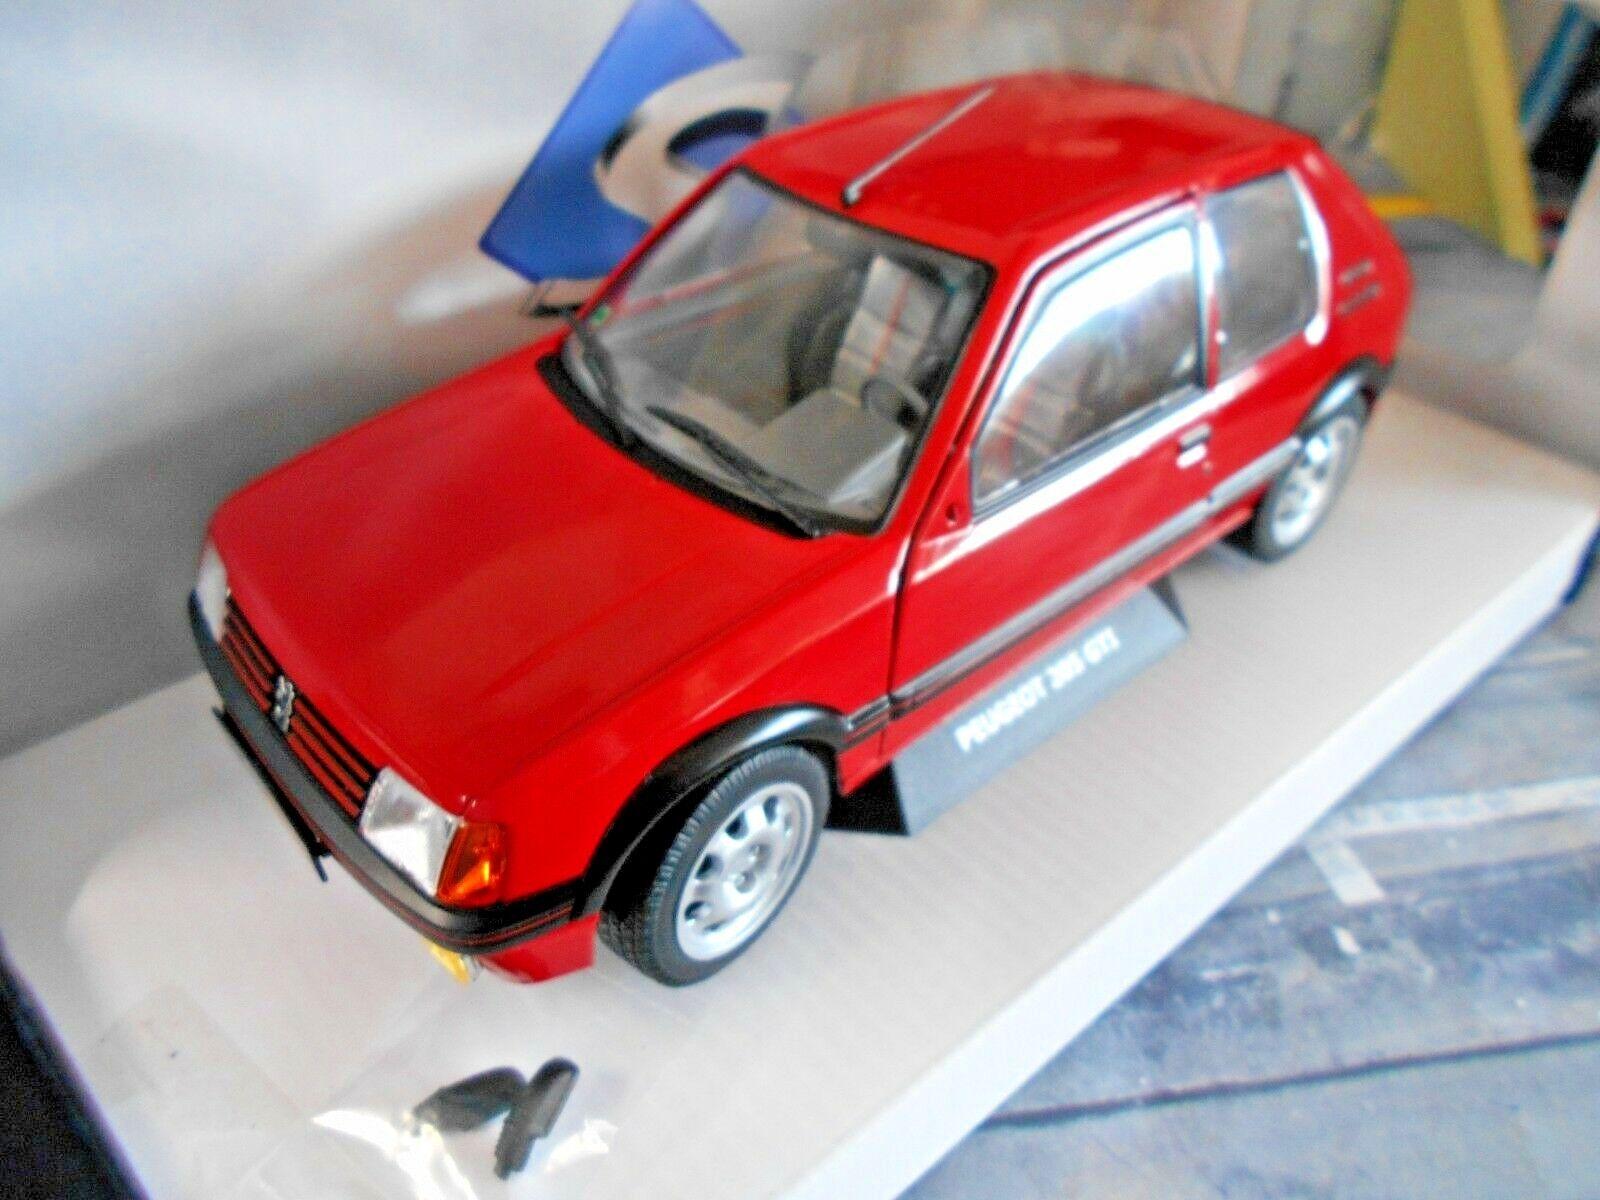 Peugeot 205 GTI MKI 1.9 Sport Sport Sport 1985 rojo rojo nuevo solido metal 1 18 2b0523